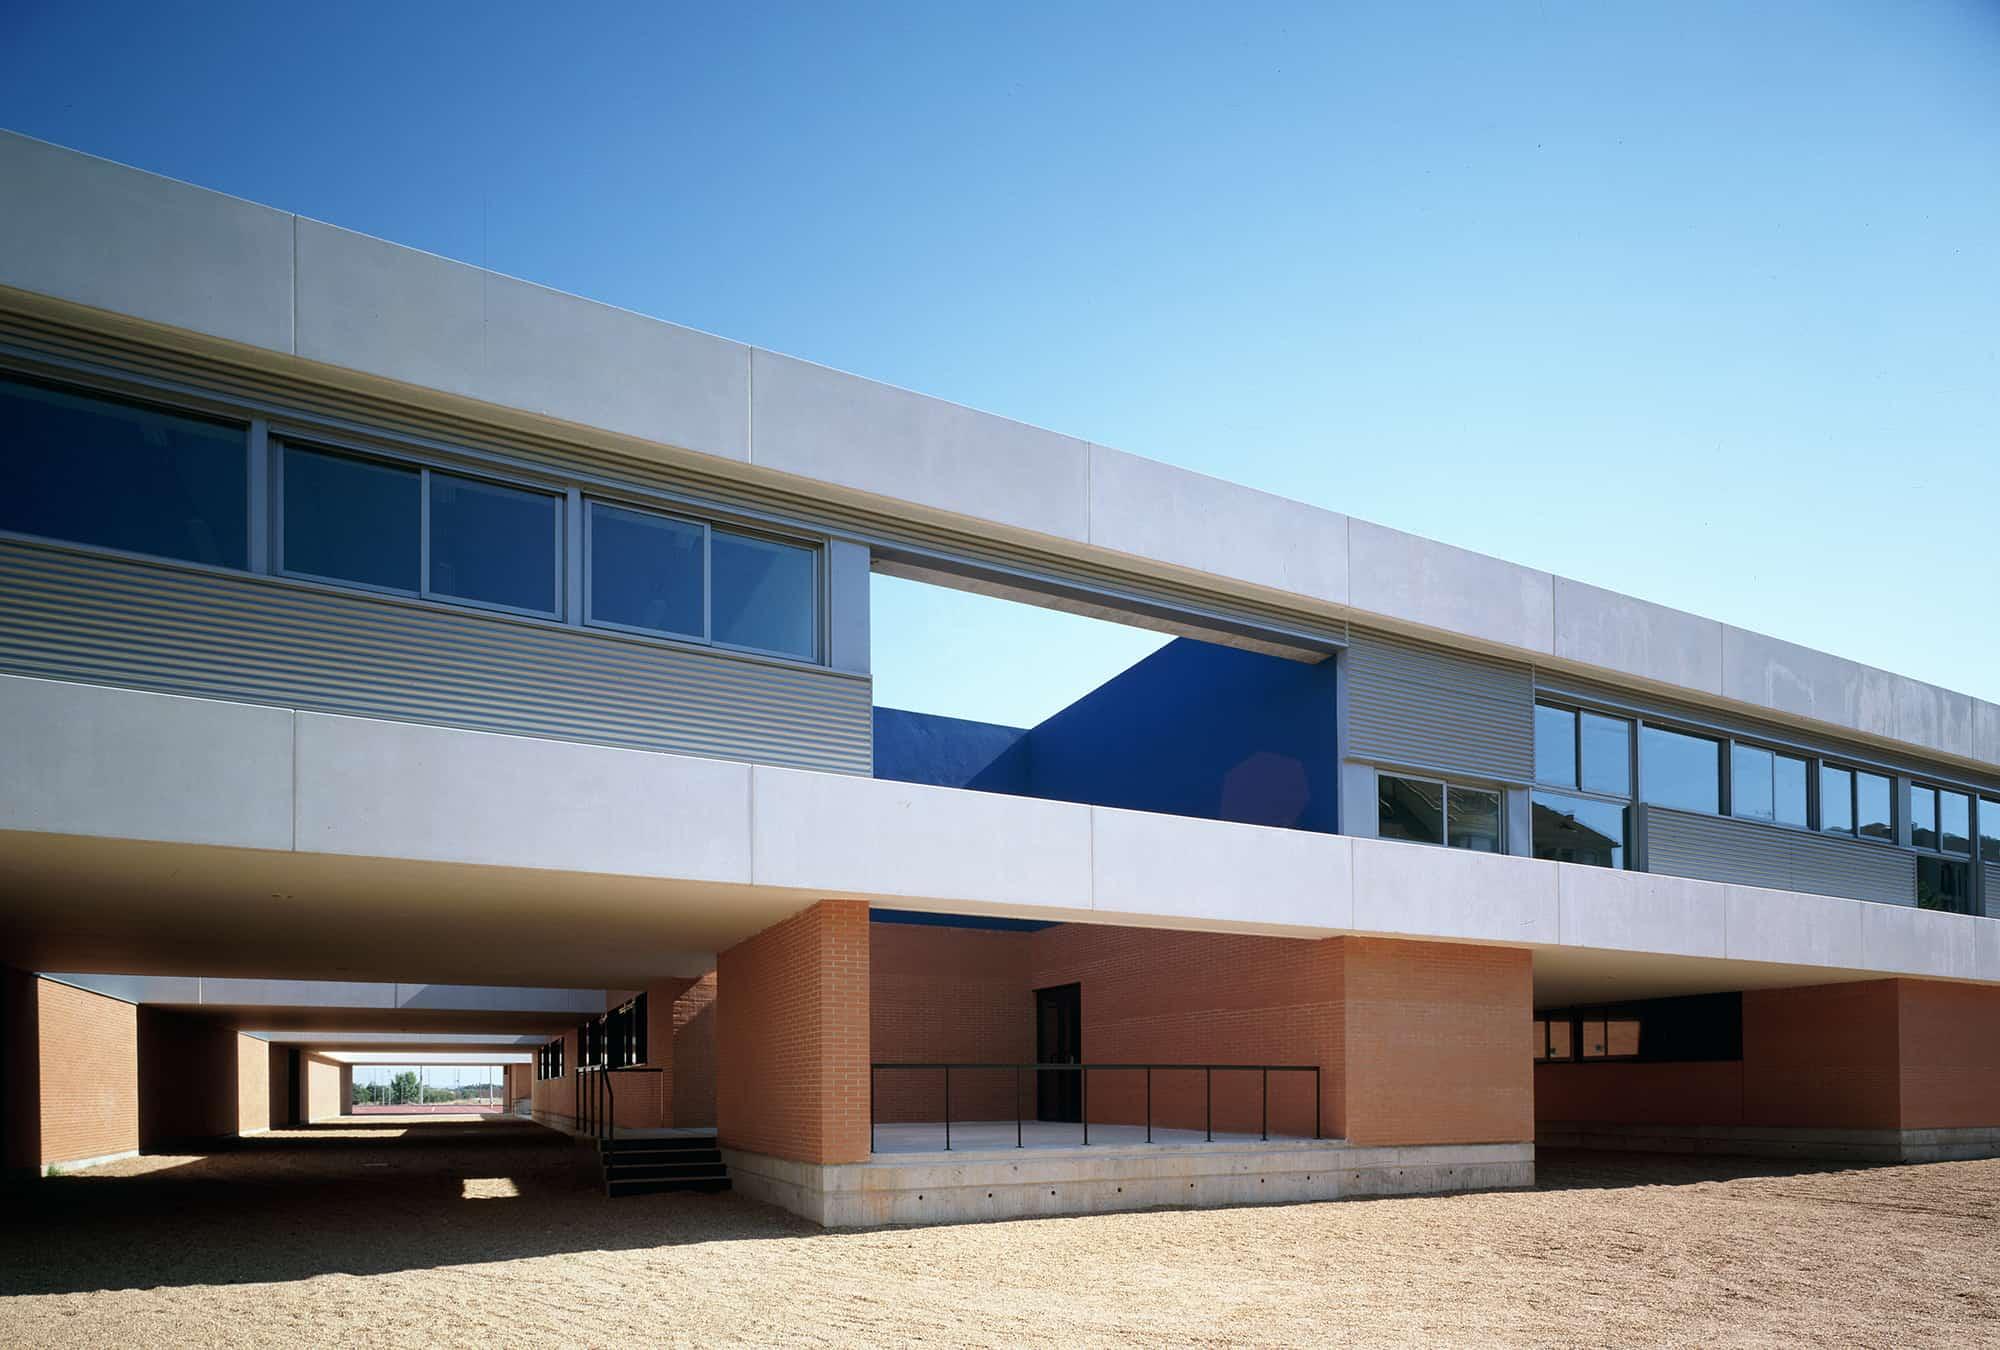 IES BADAJOZ - arquitectura escolar - LANDINEZ+REY | equipo L2G arquitectos, slp [ eL2Gaa ]